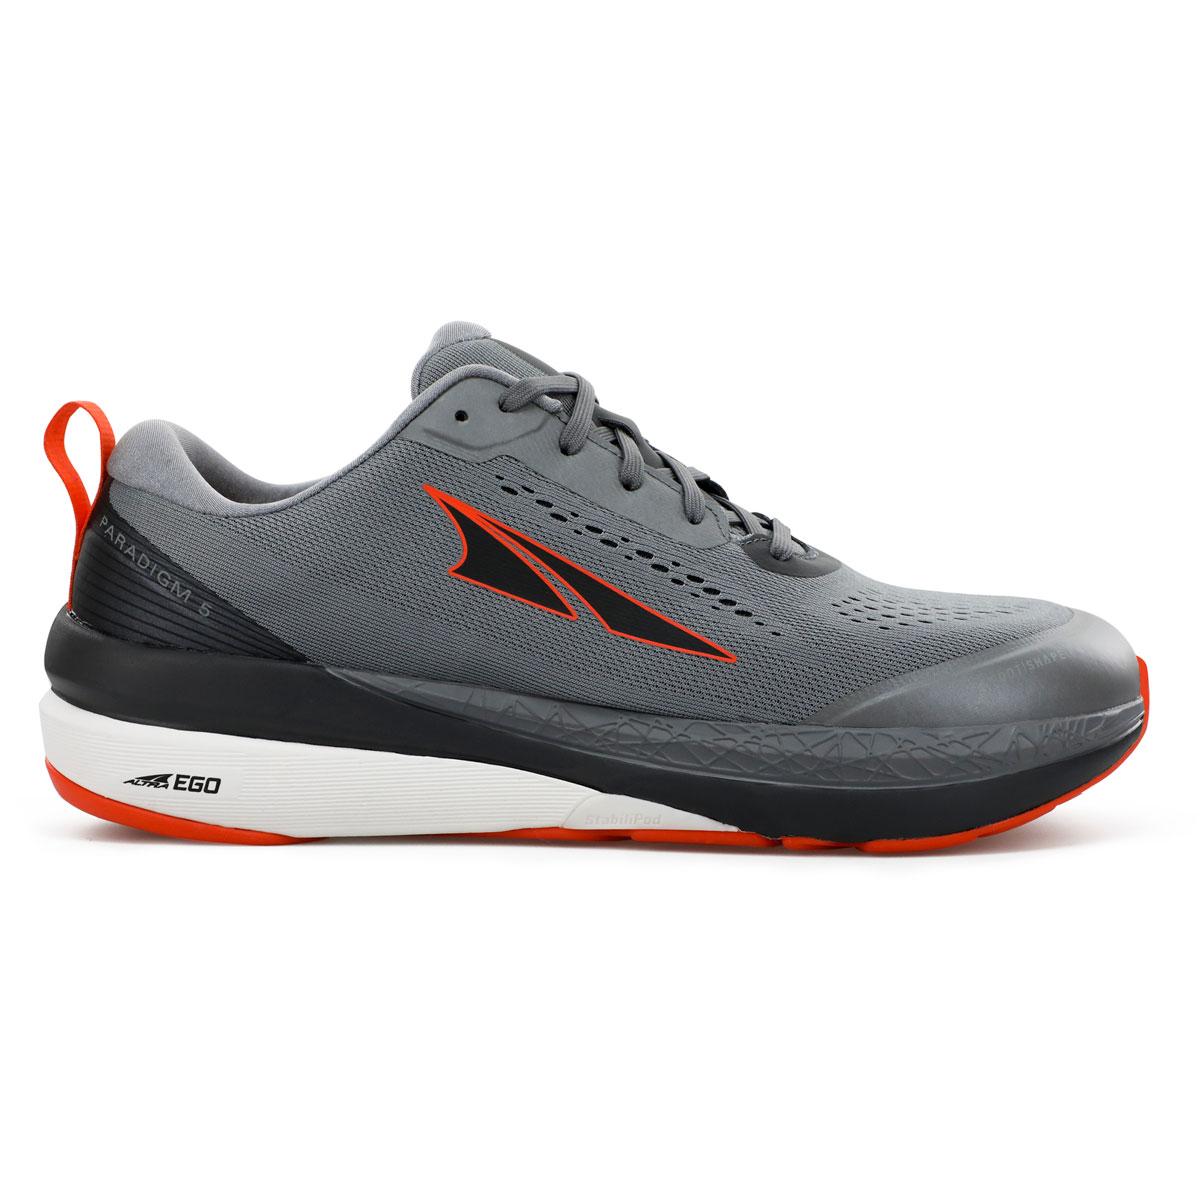 Men's Altra Paradigm 5 Running Shoe - Color: Gray/Orange - Size: 9.5 - Width: Regular, Gray/Orange, large, image 1